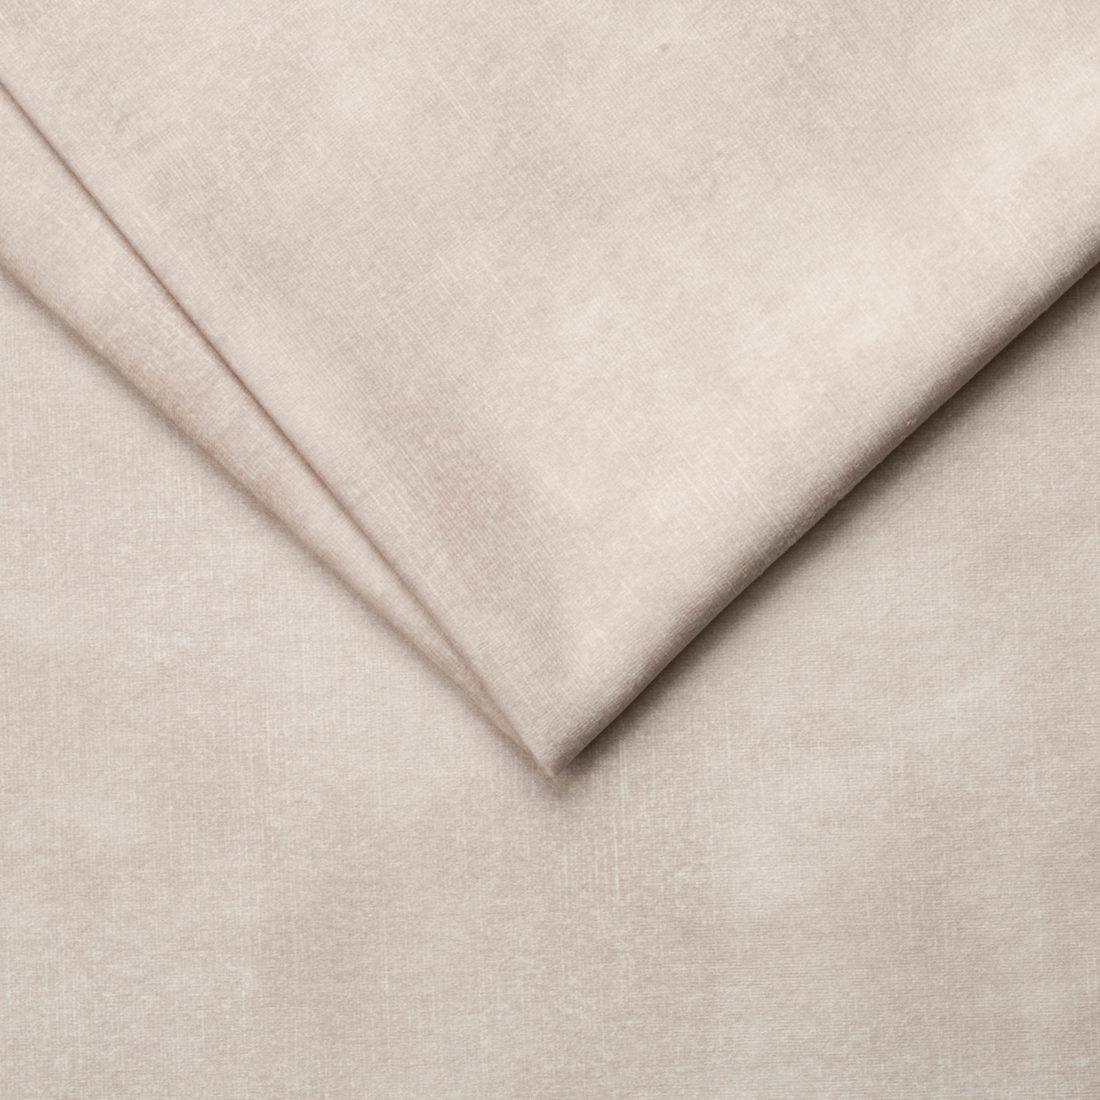 Меблева тканина Palladium 2 Beige, велюр